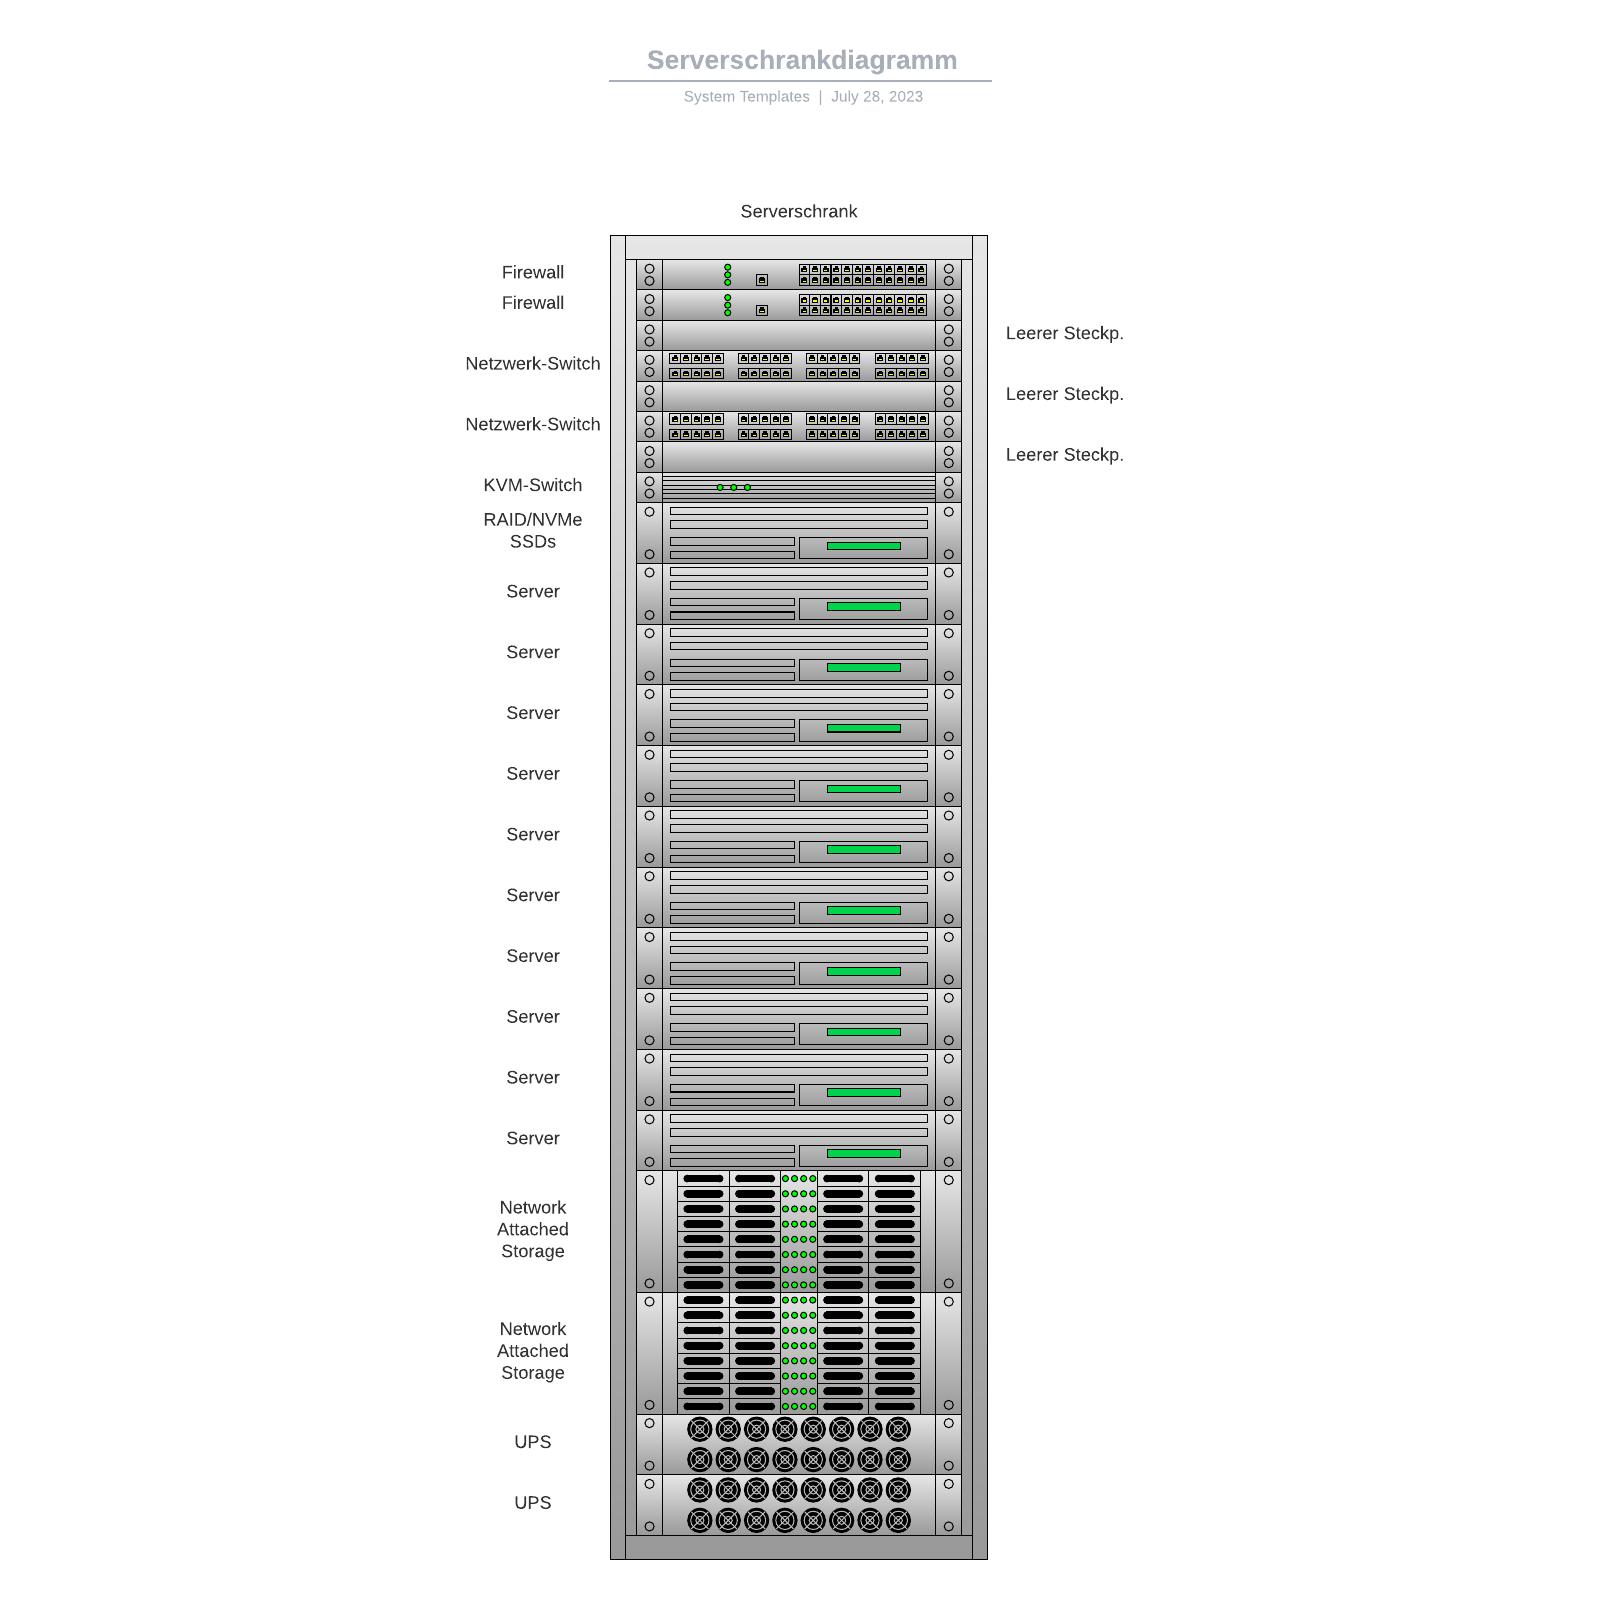 Serverschrankdiagramm